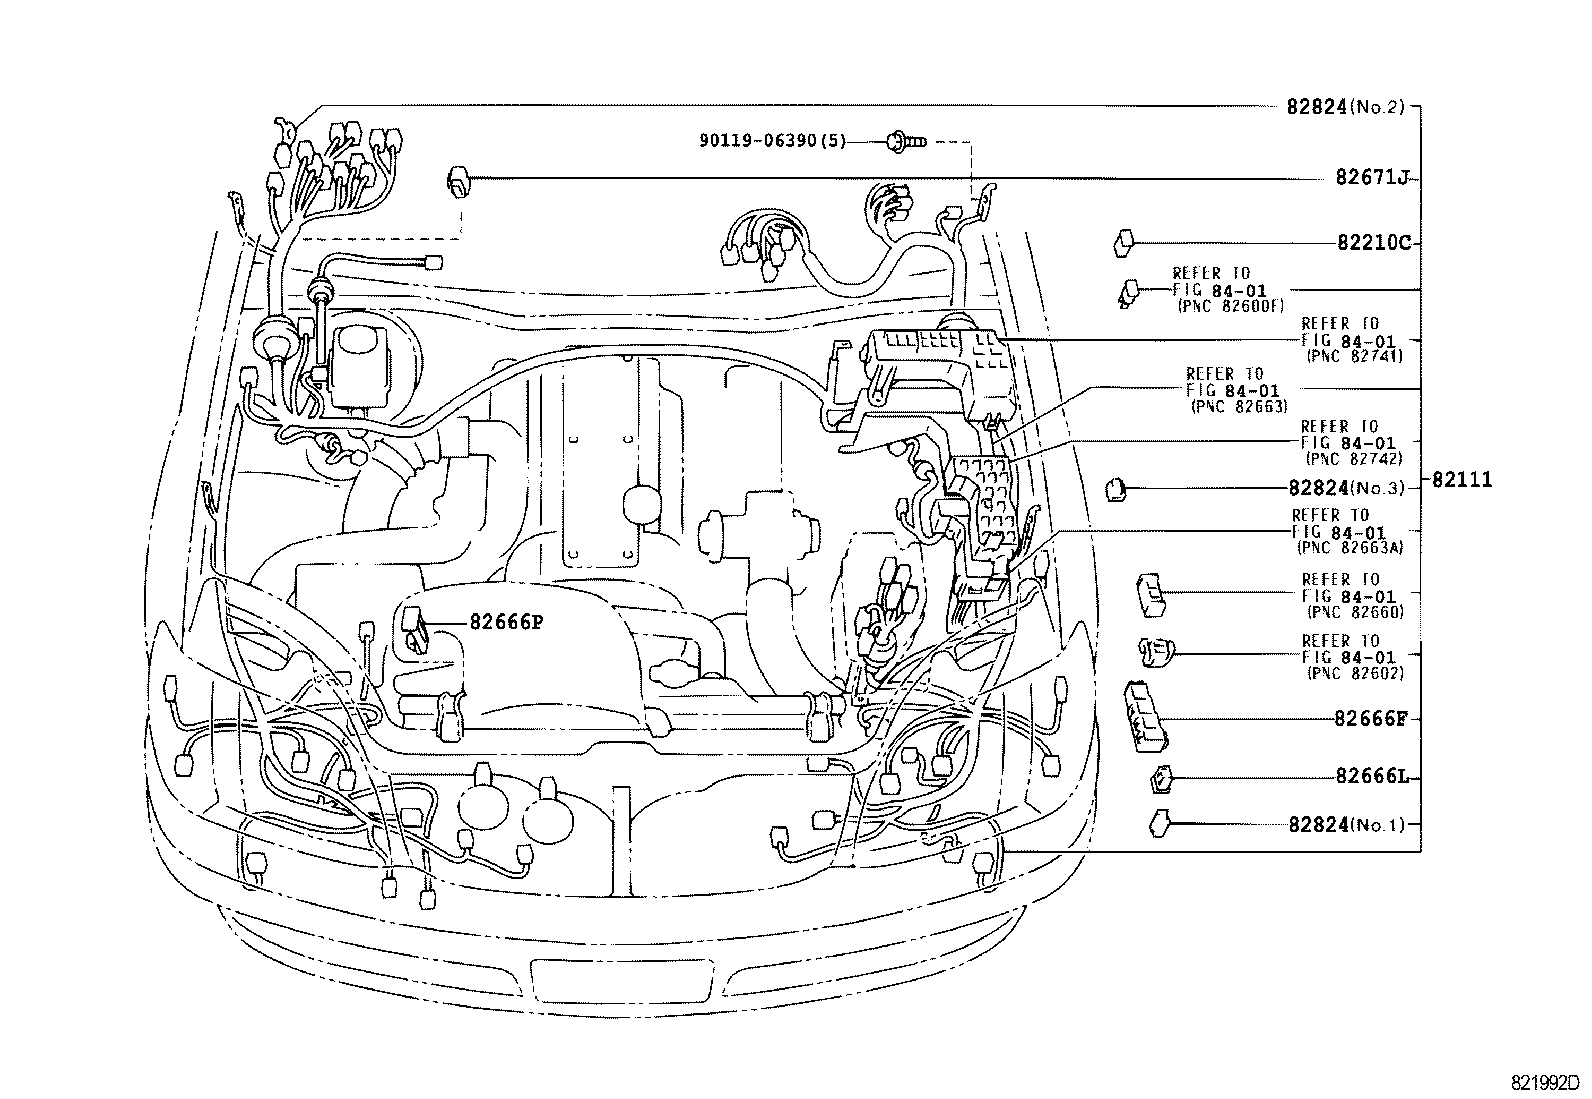 Wiring Diagram Toyota Crown 2jzge